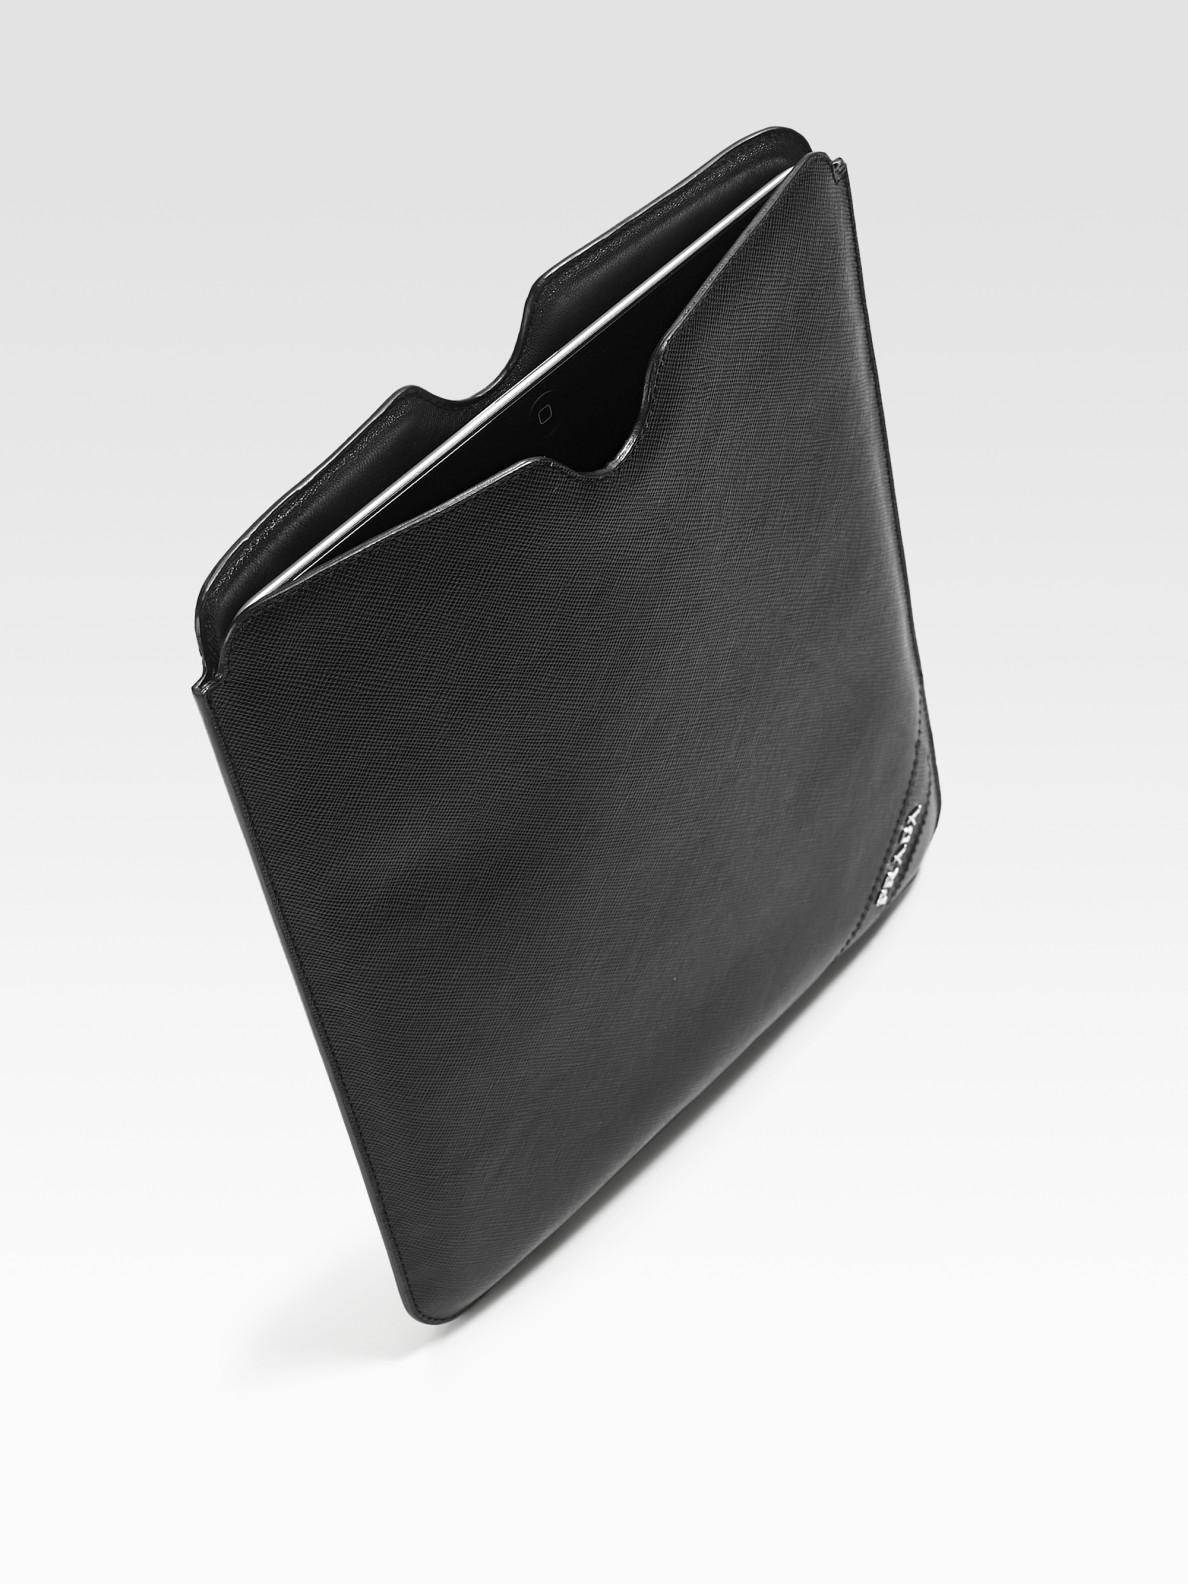 ea564572108e Lyst - Prada Leather Case For Ipad in Black for Men